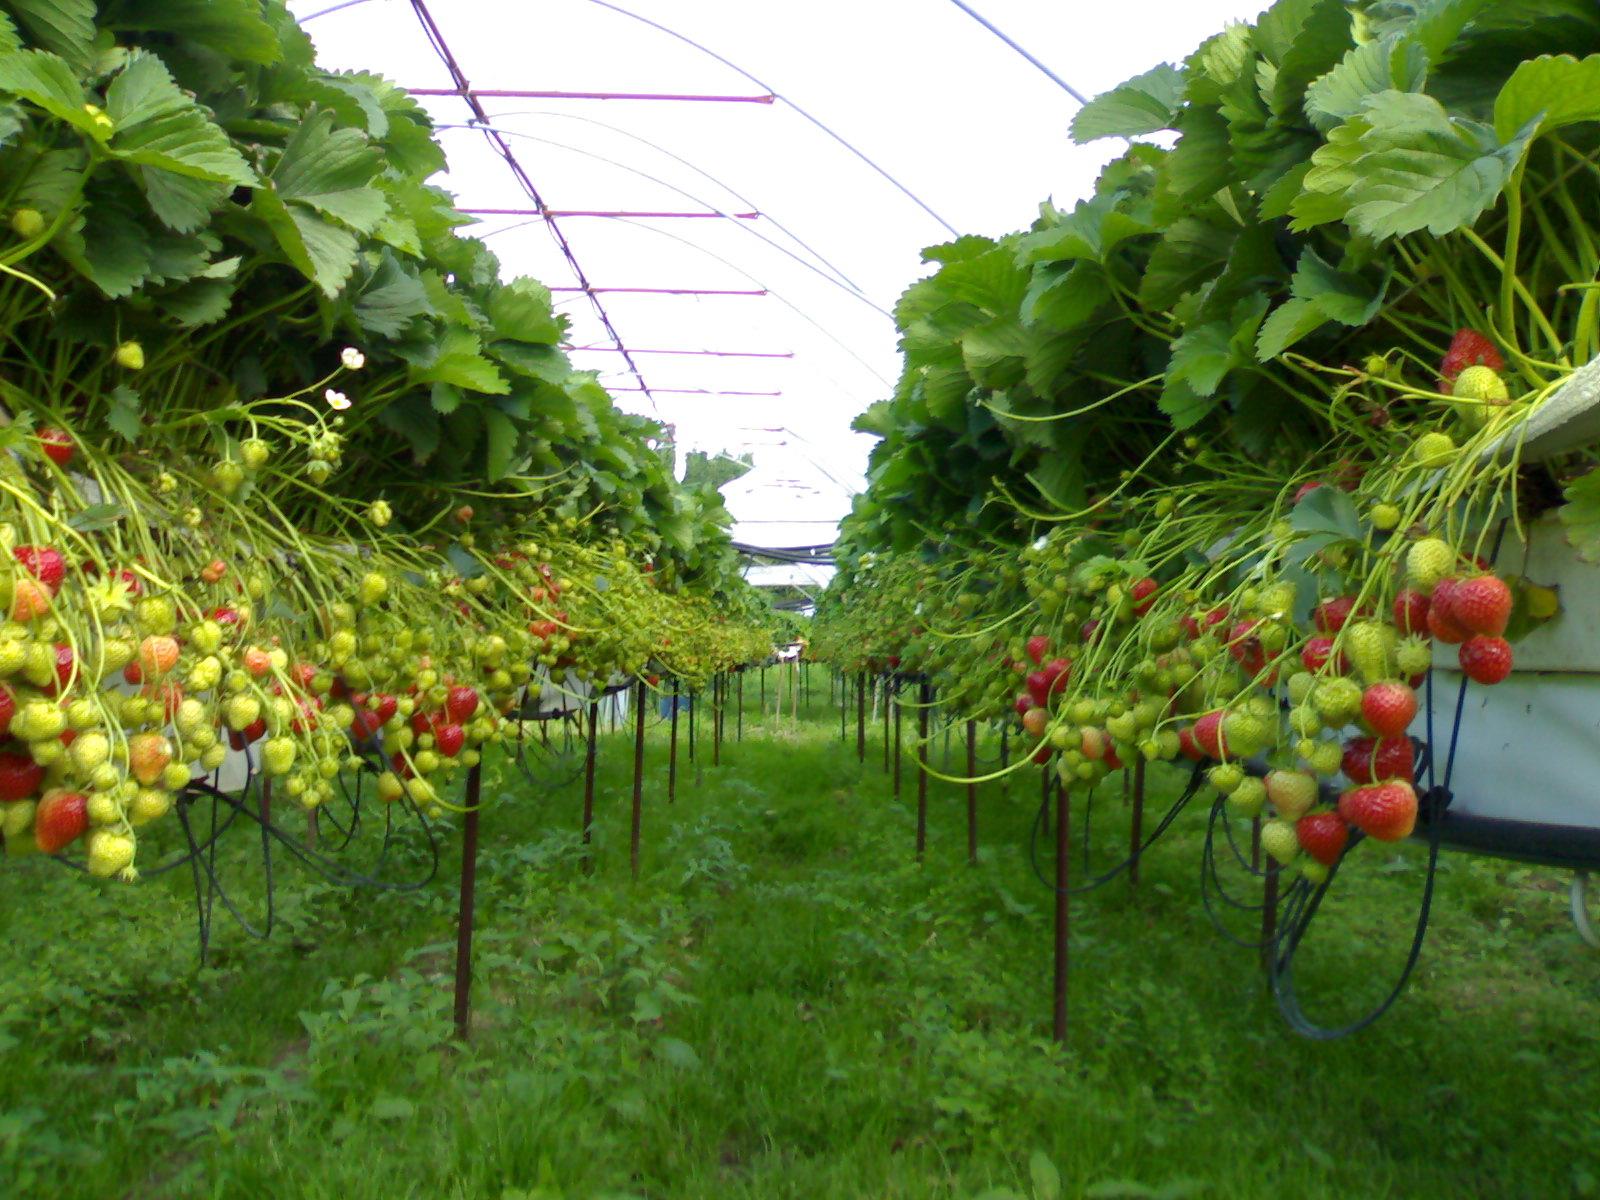 Consultora experta en hidroponia de fresa en Italia